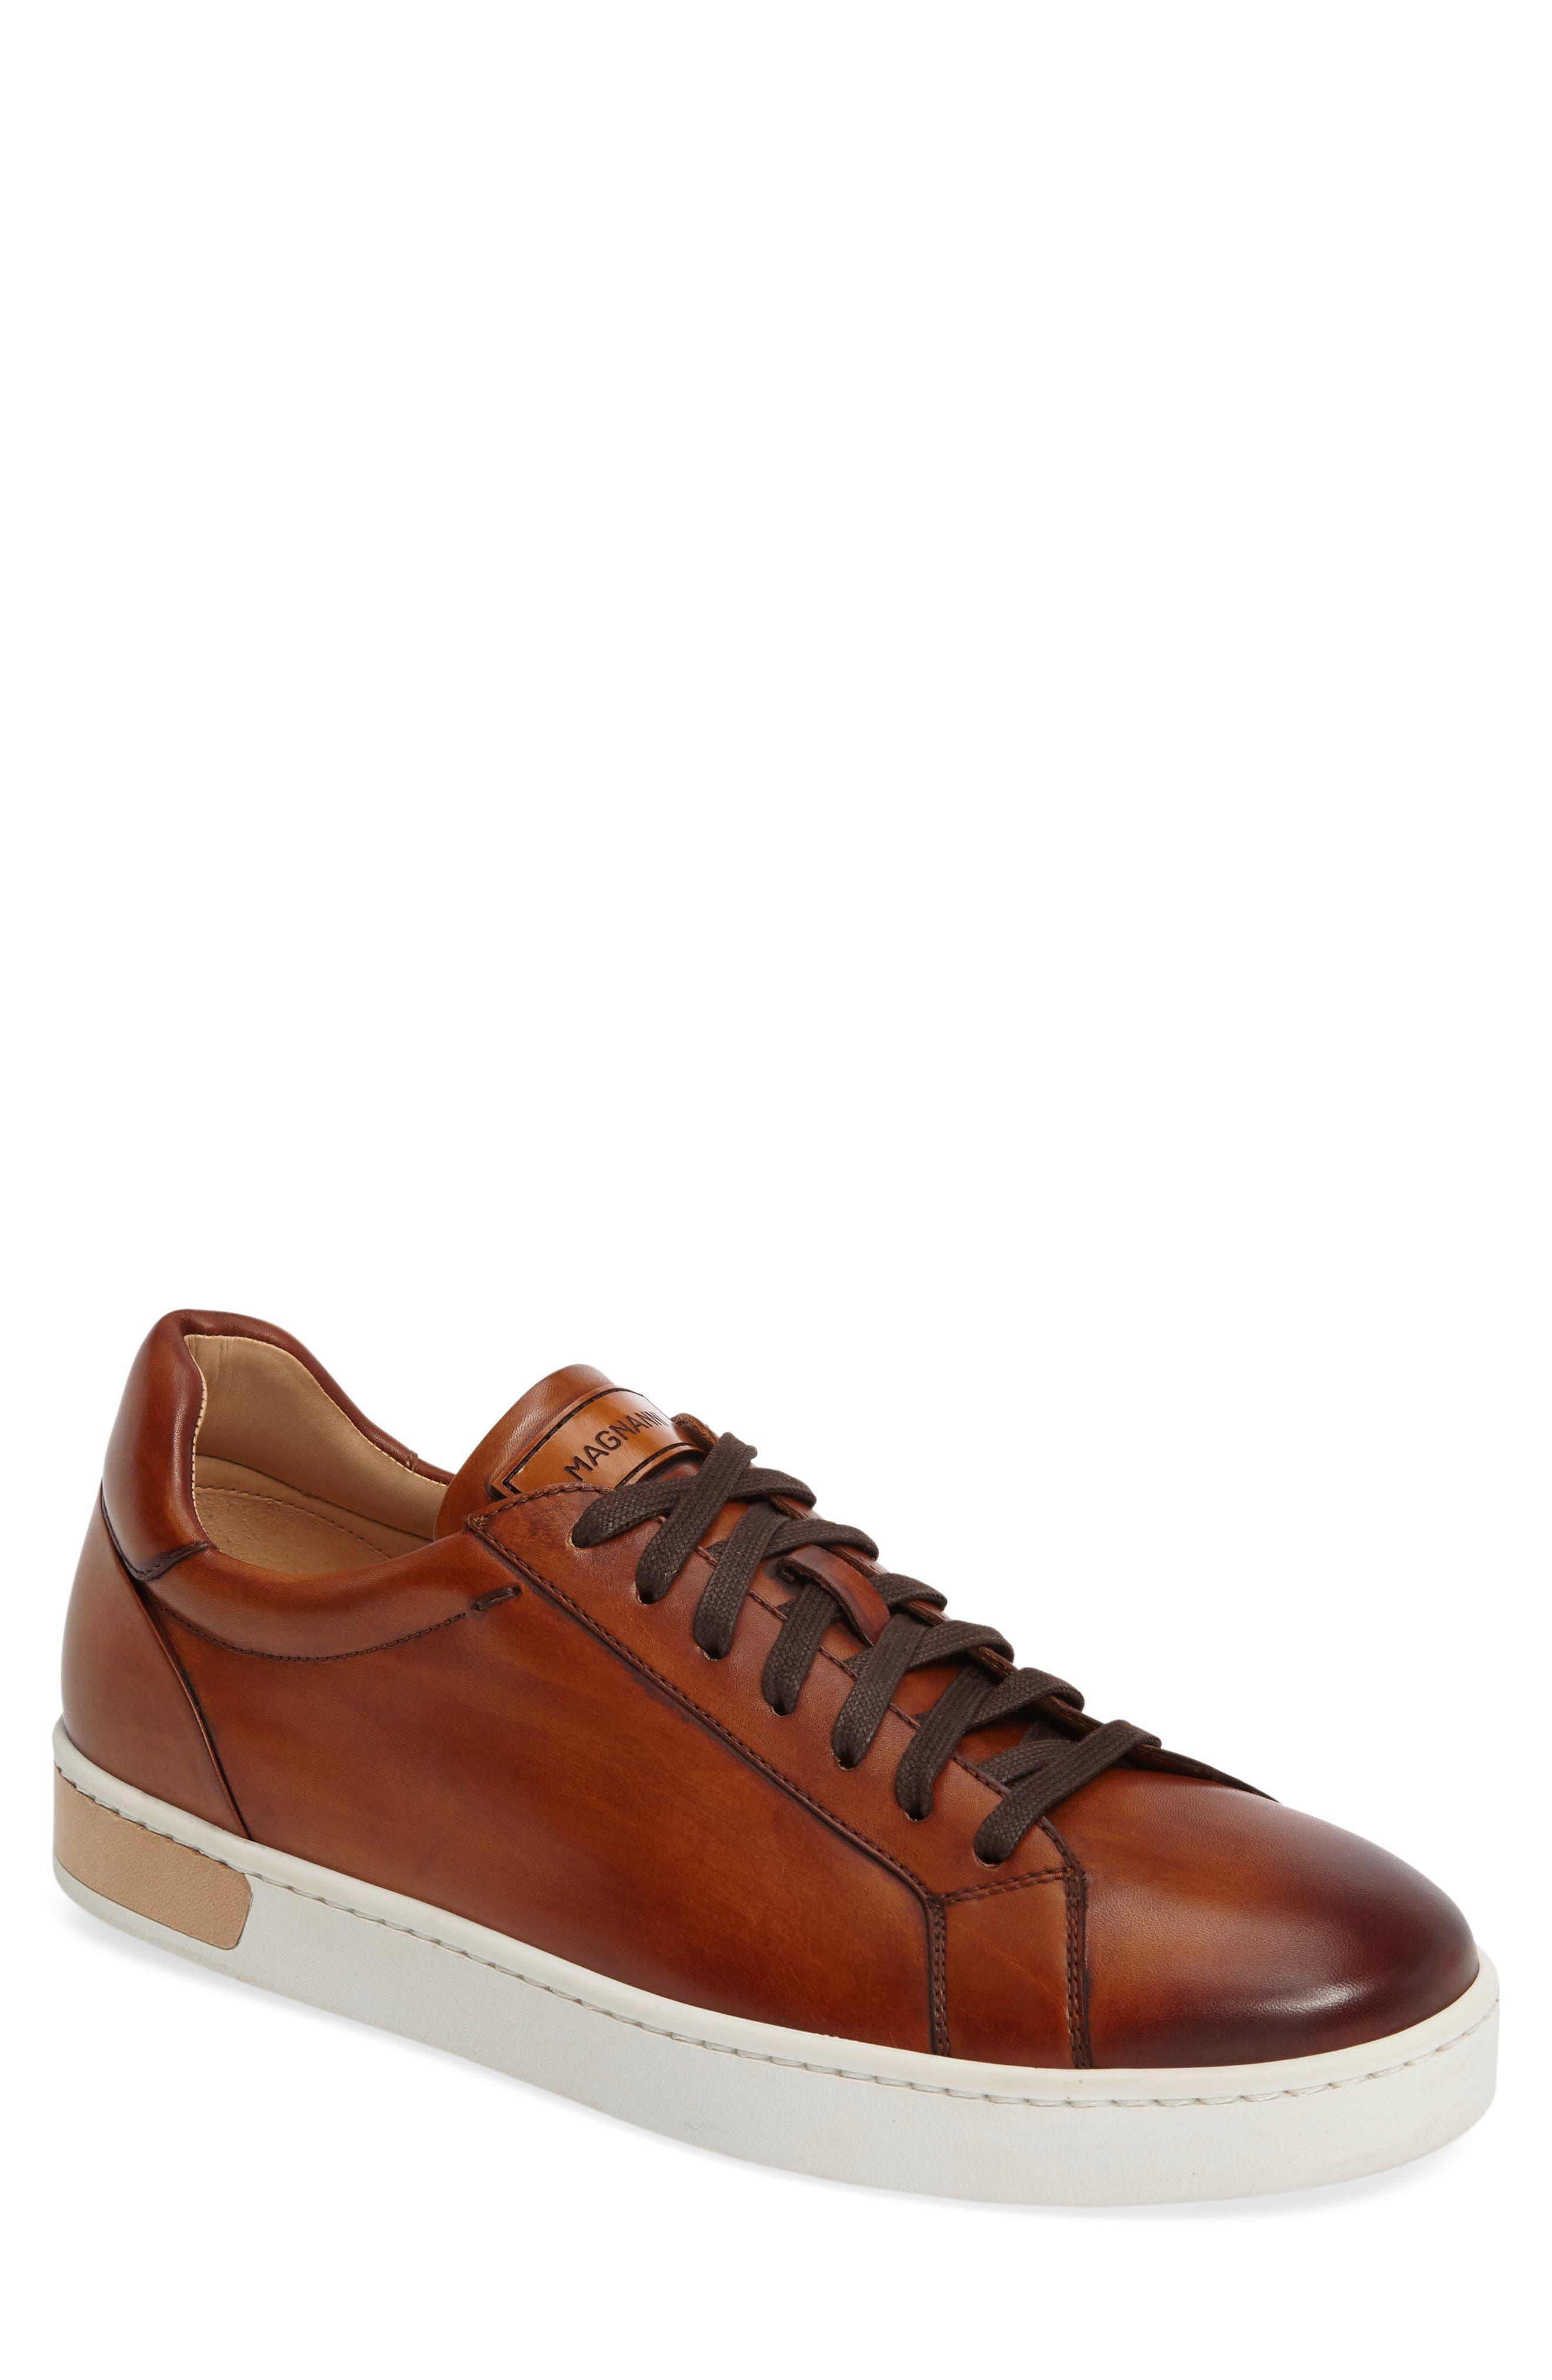 Caballero Sneaker, Main, color, COGNAC LEATHER